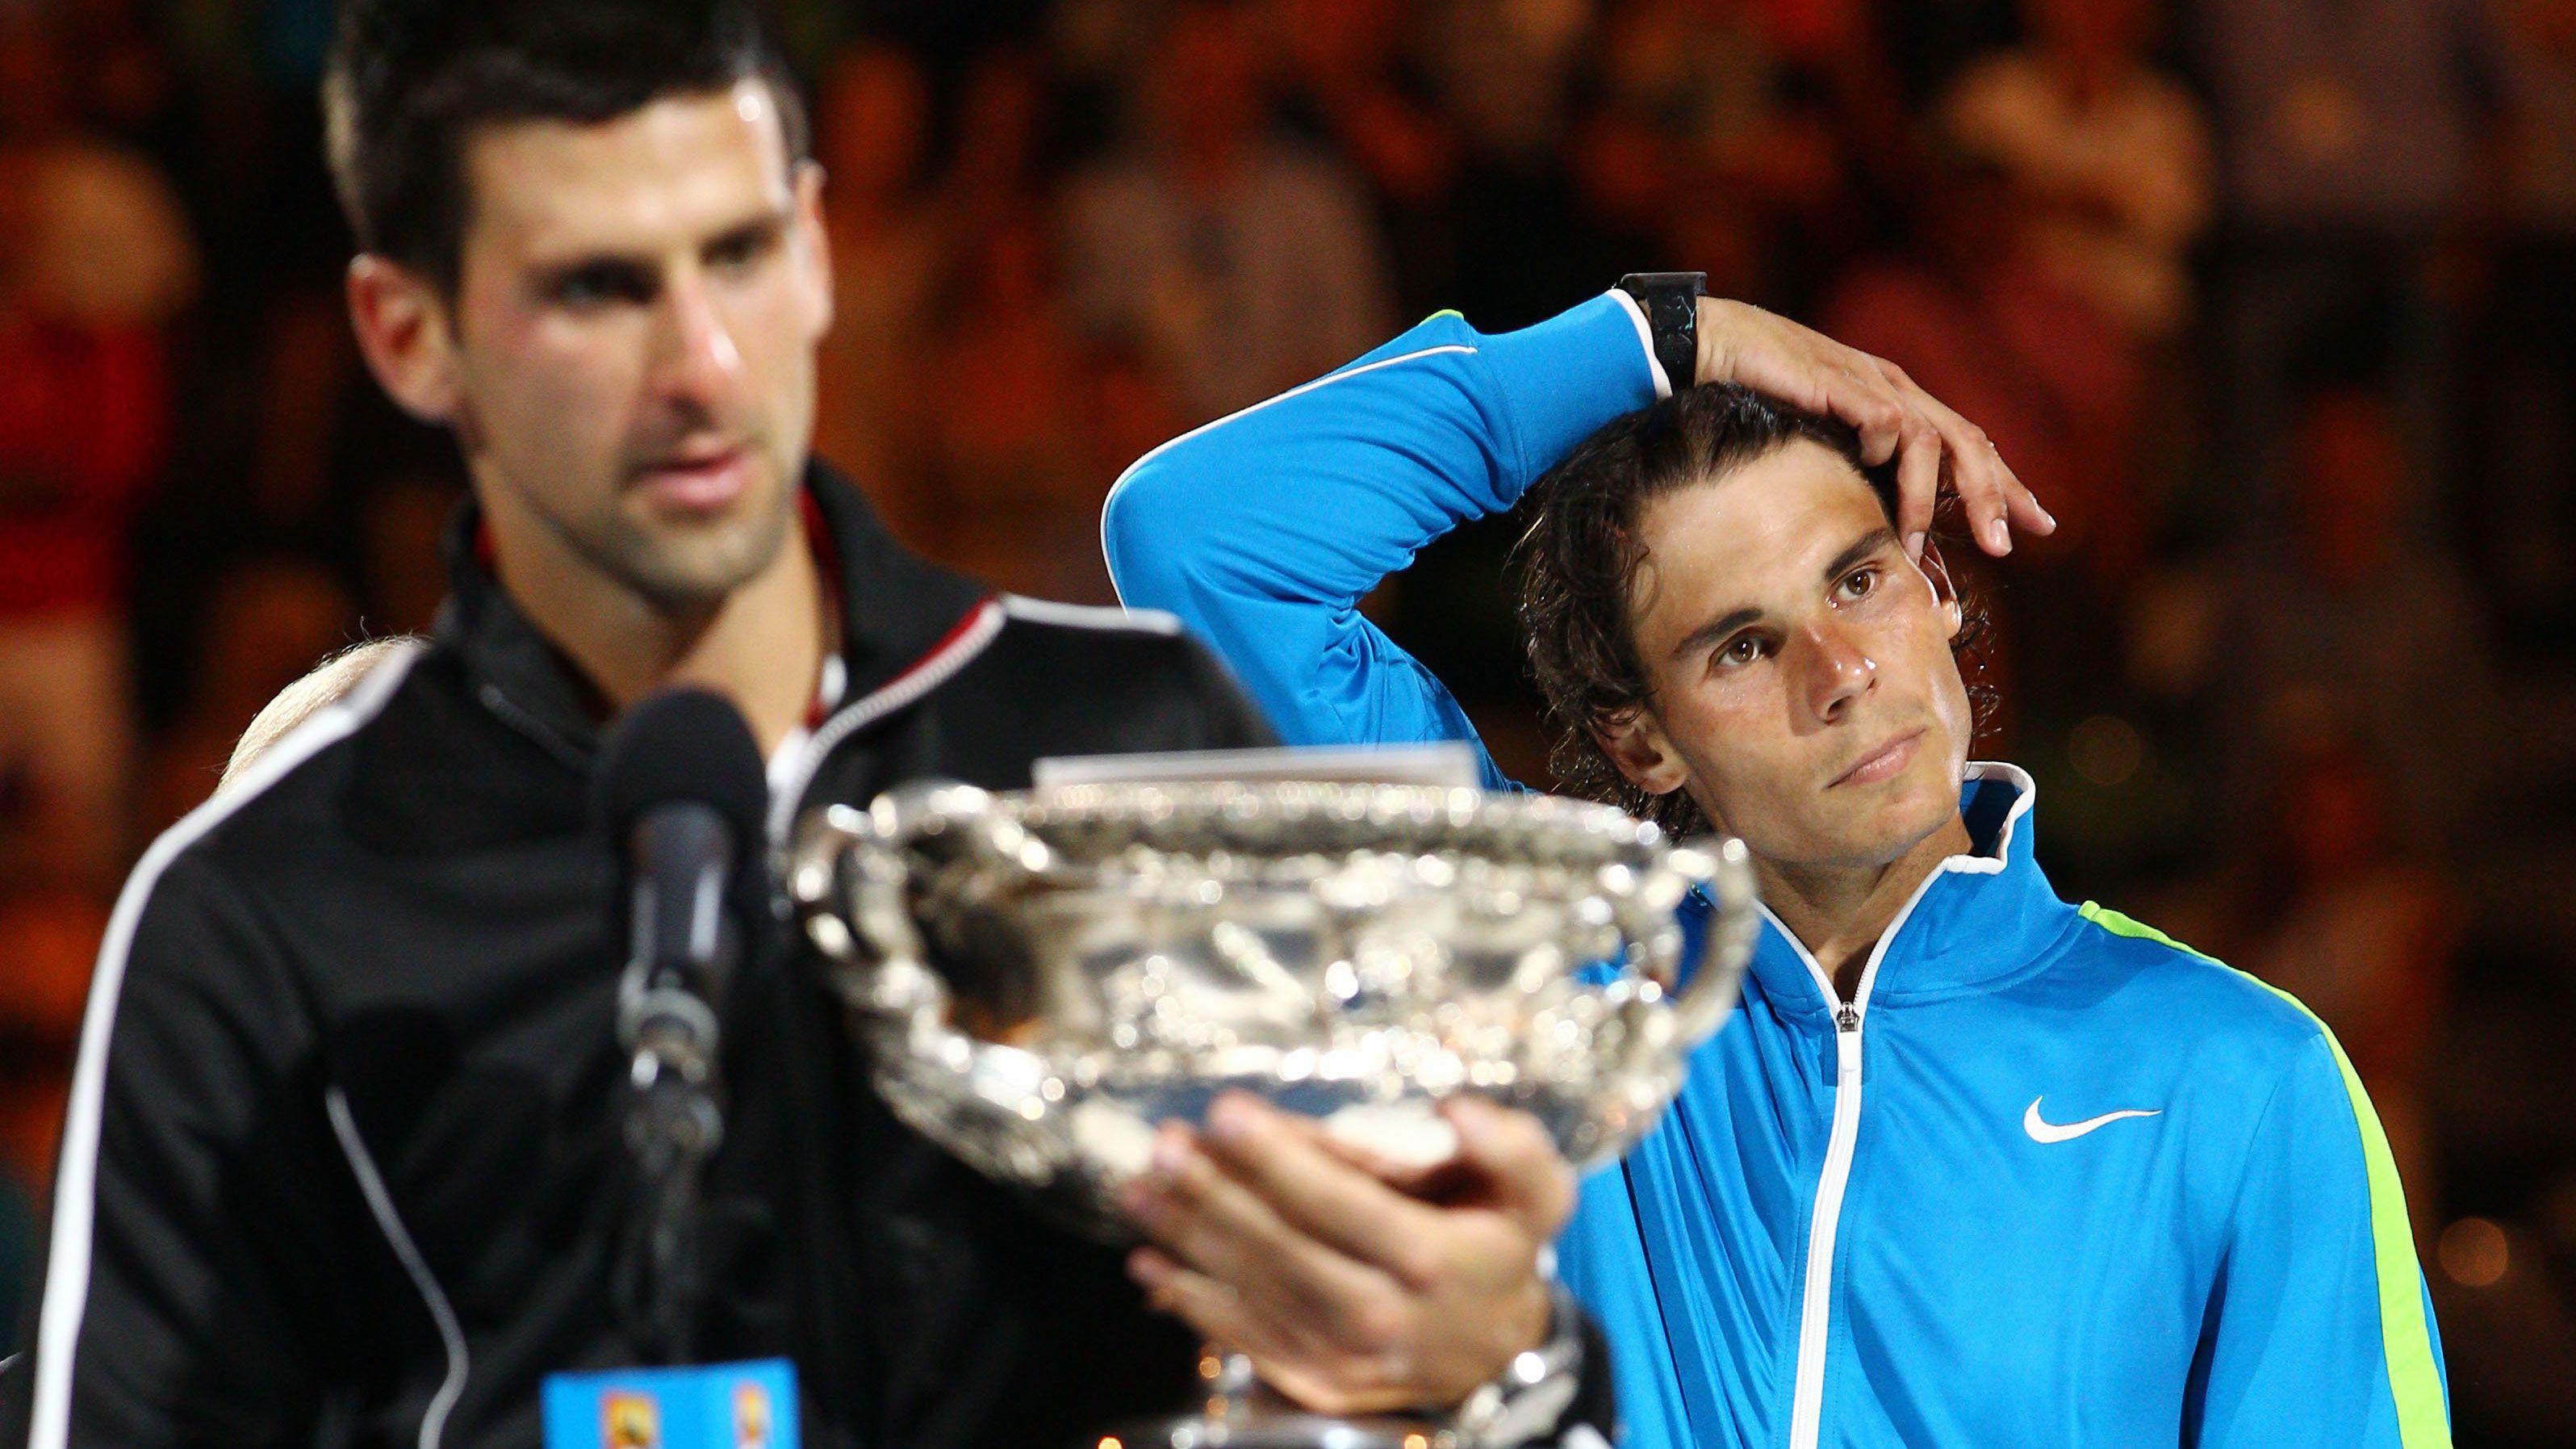 641bdb7a USA men's tennis crisis | Australian Open star Frances Tiafoe lone ...